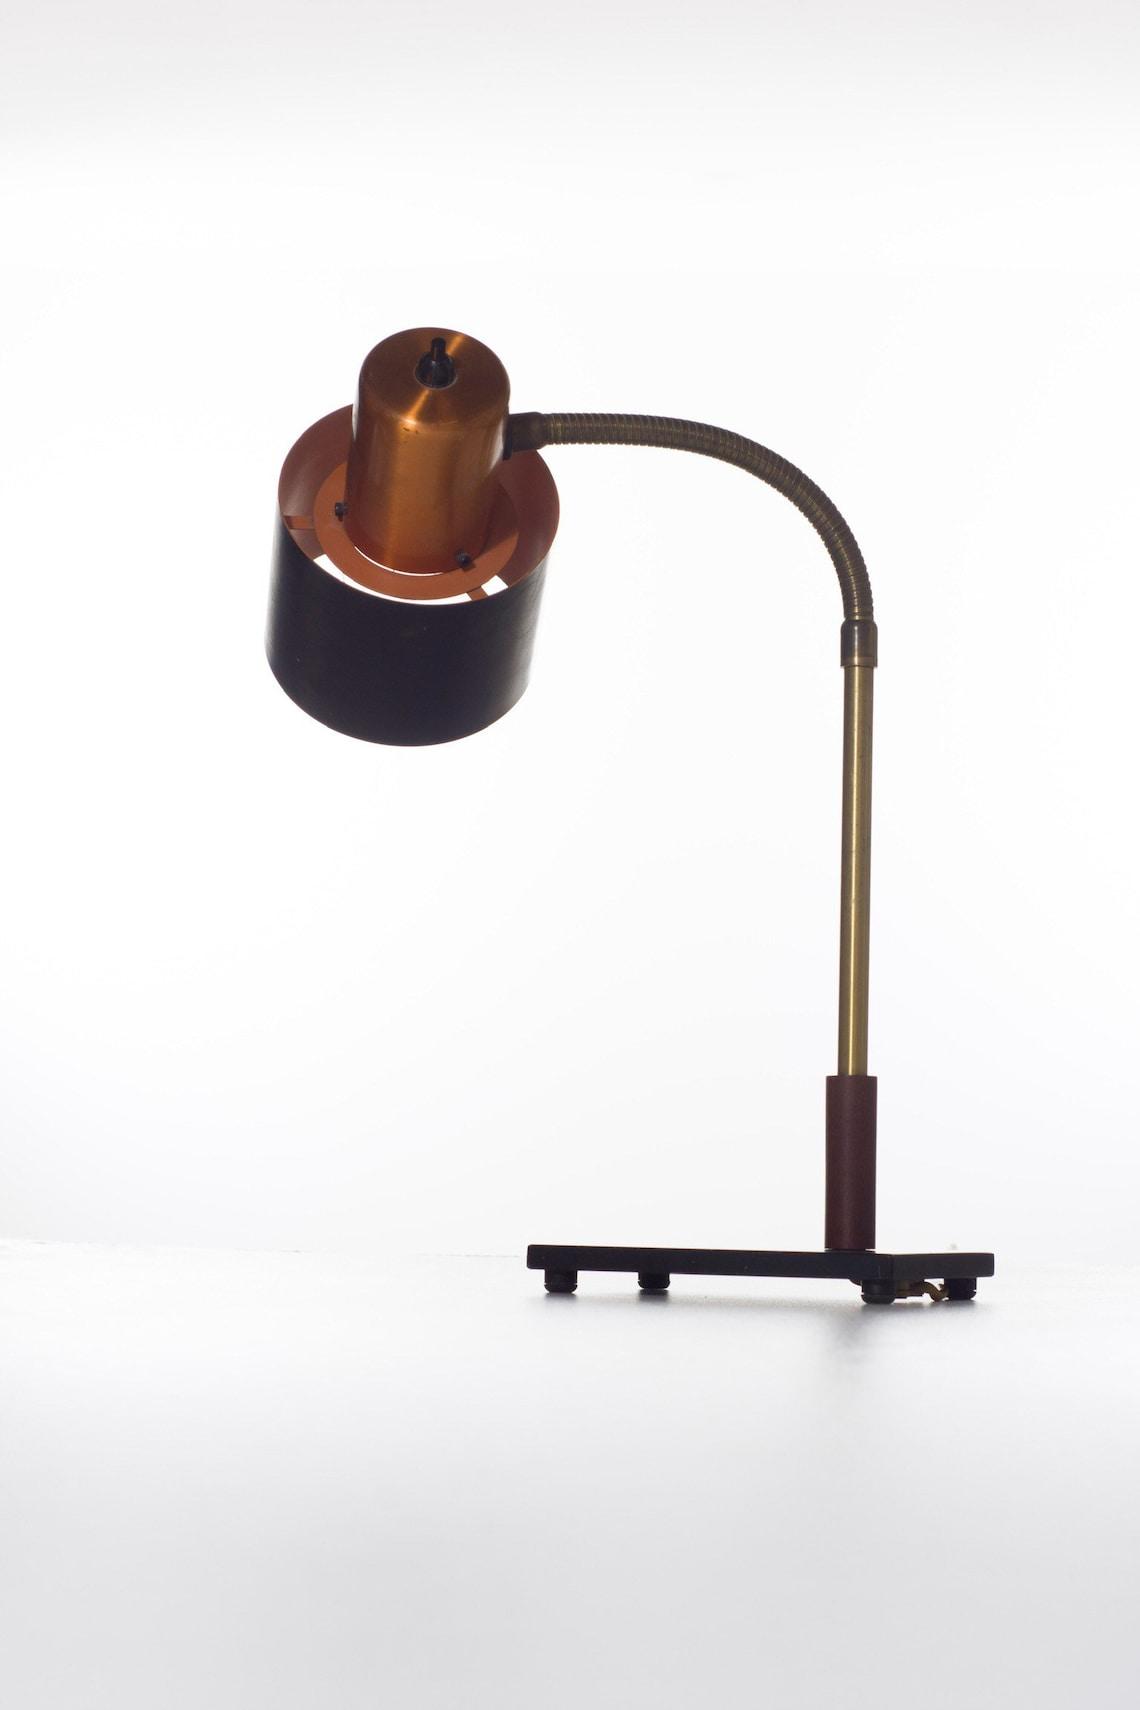 Image of: Jo Hammerborg Danish Vintage Copper Desk Lamp Beta For Fog And Morup Mid Century Modern Desk